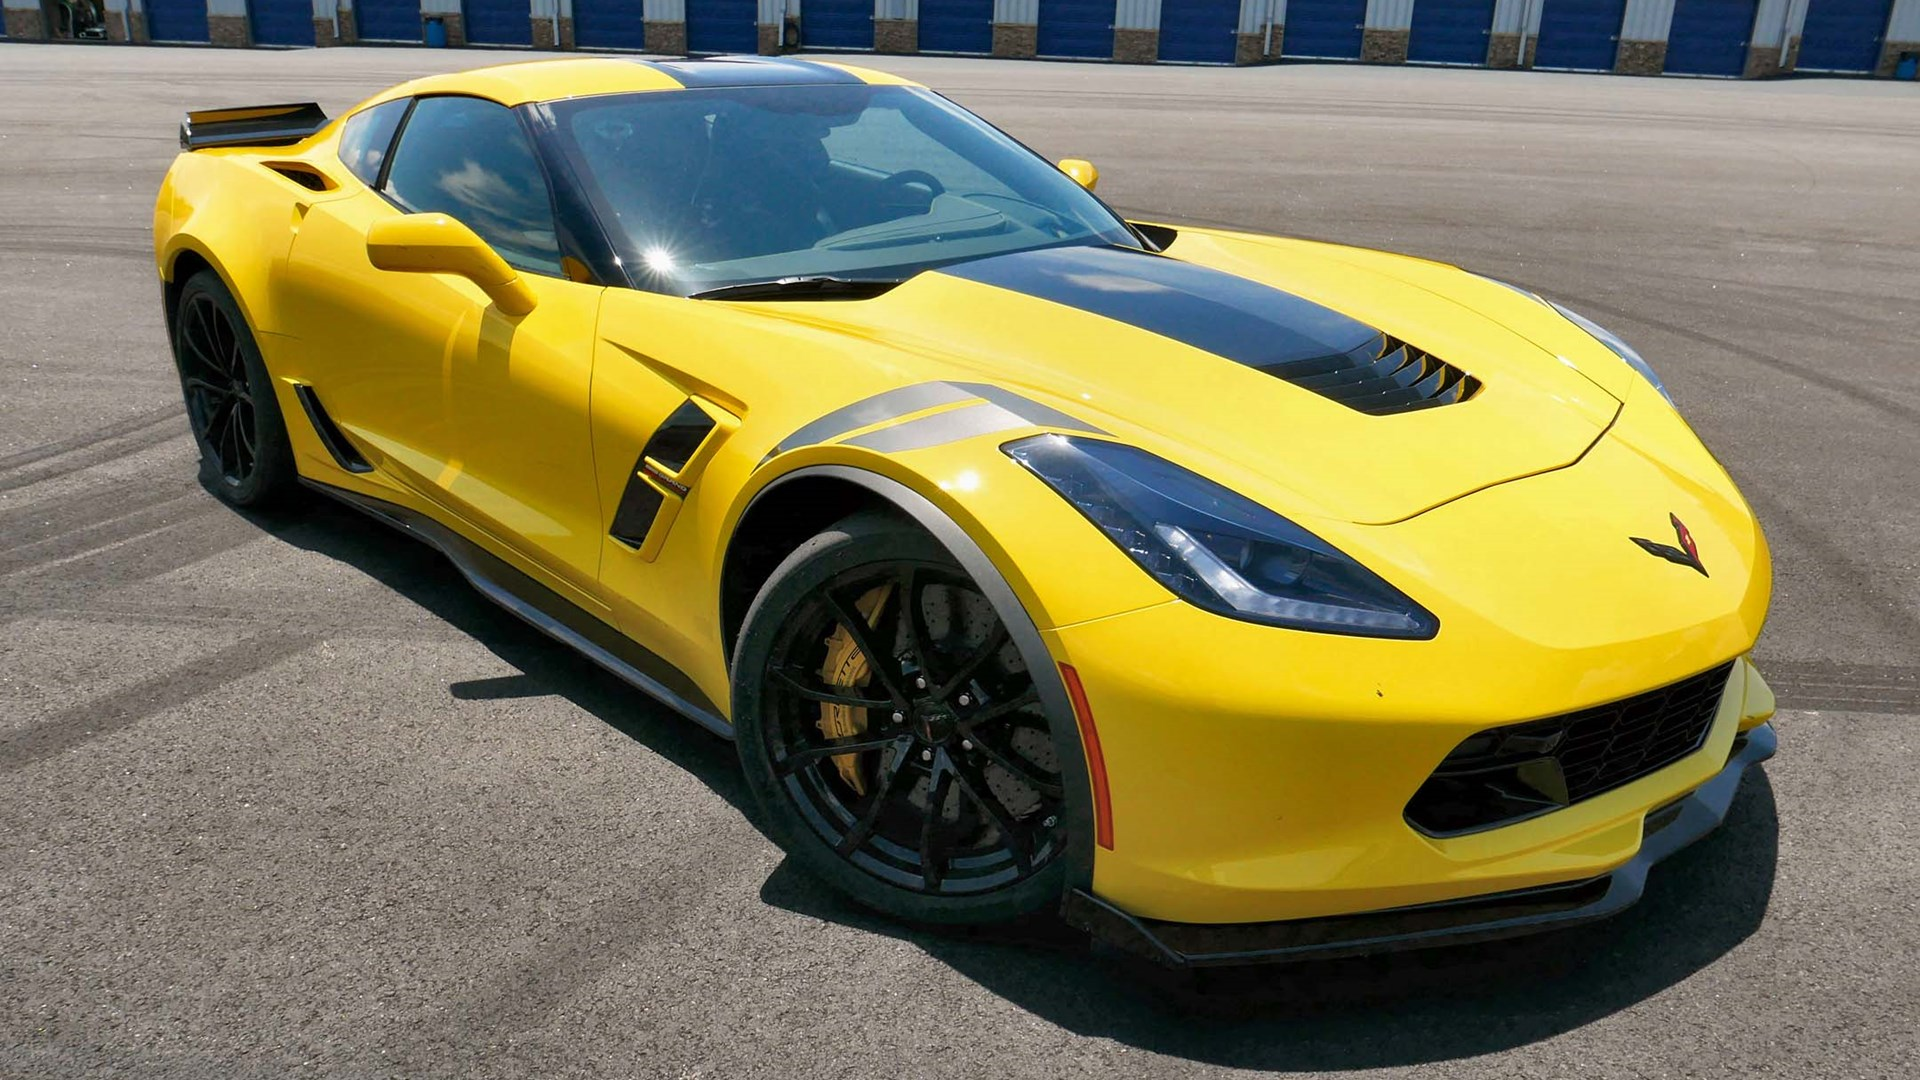 2014 2018 Chevrolet Corvette Used Vehicle Review